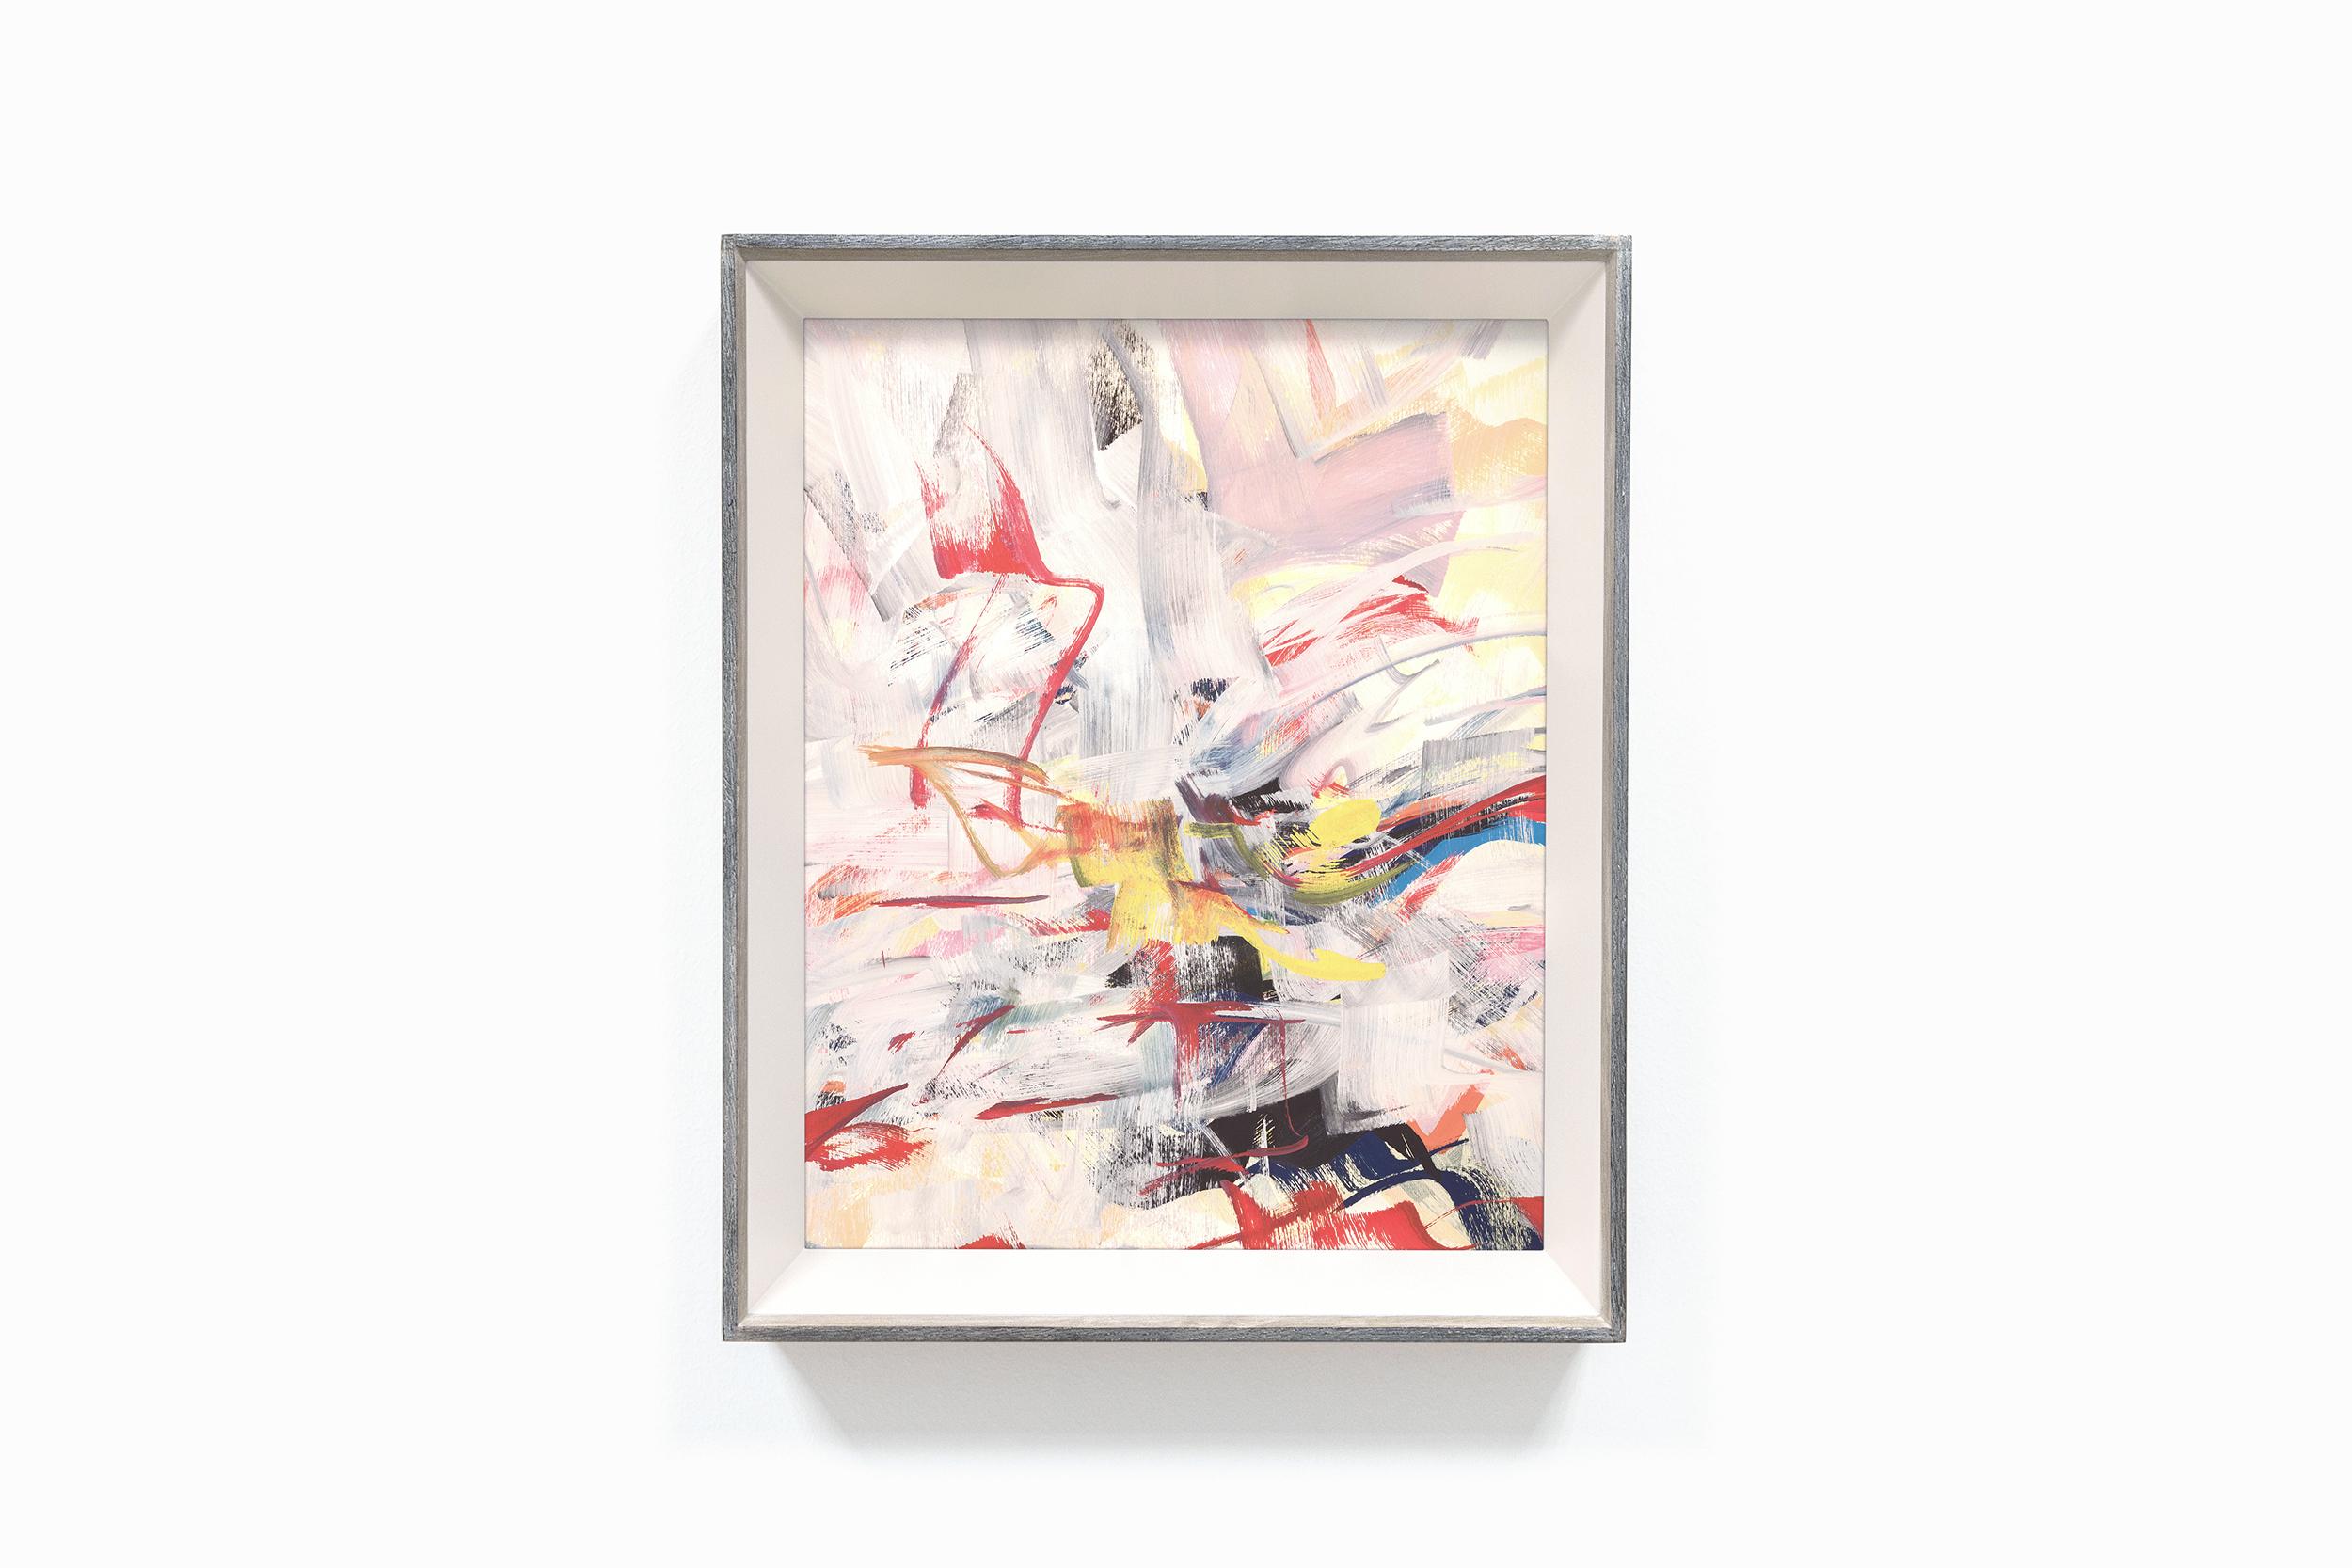 bonjourmolotov+Restless+Illustration+Ilustracao+painting+pintura+acrylic+acrílico+canvas+tela+paper+cardboard+mdf+Andre+Gigante+02N2.jpg